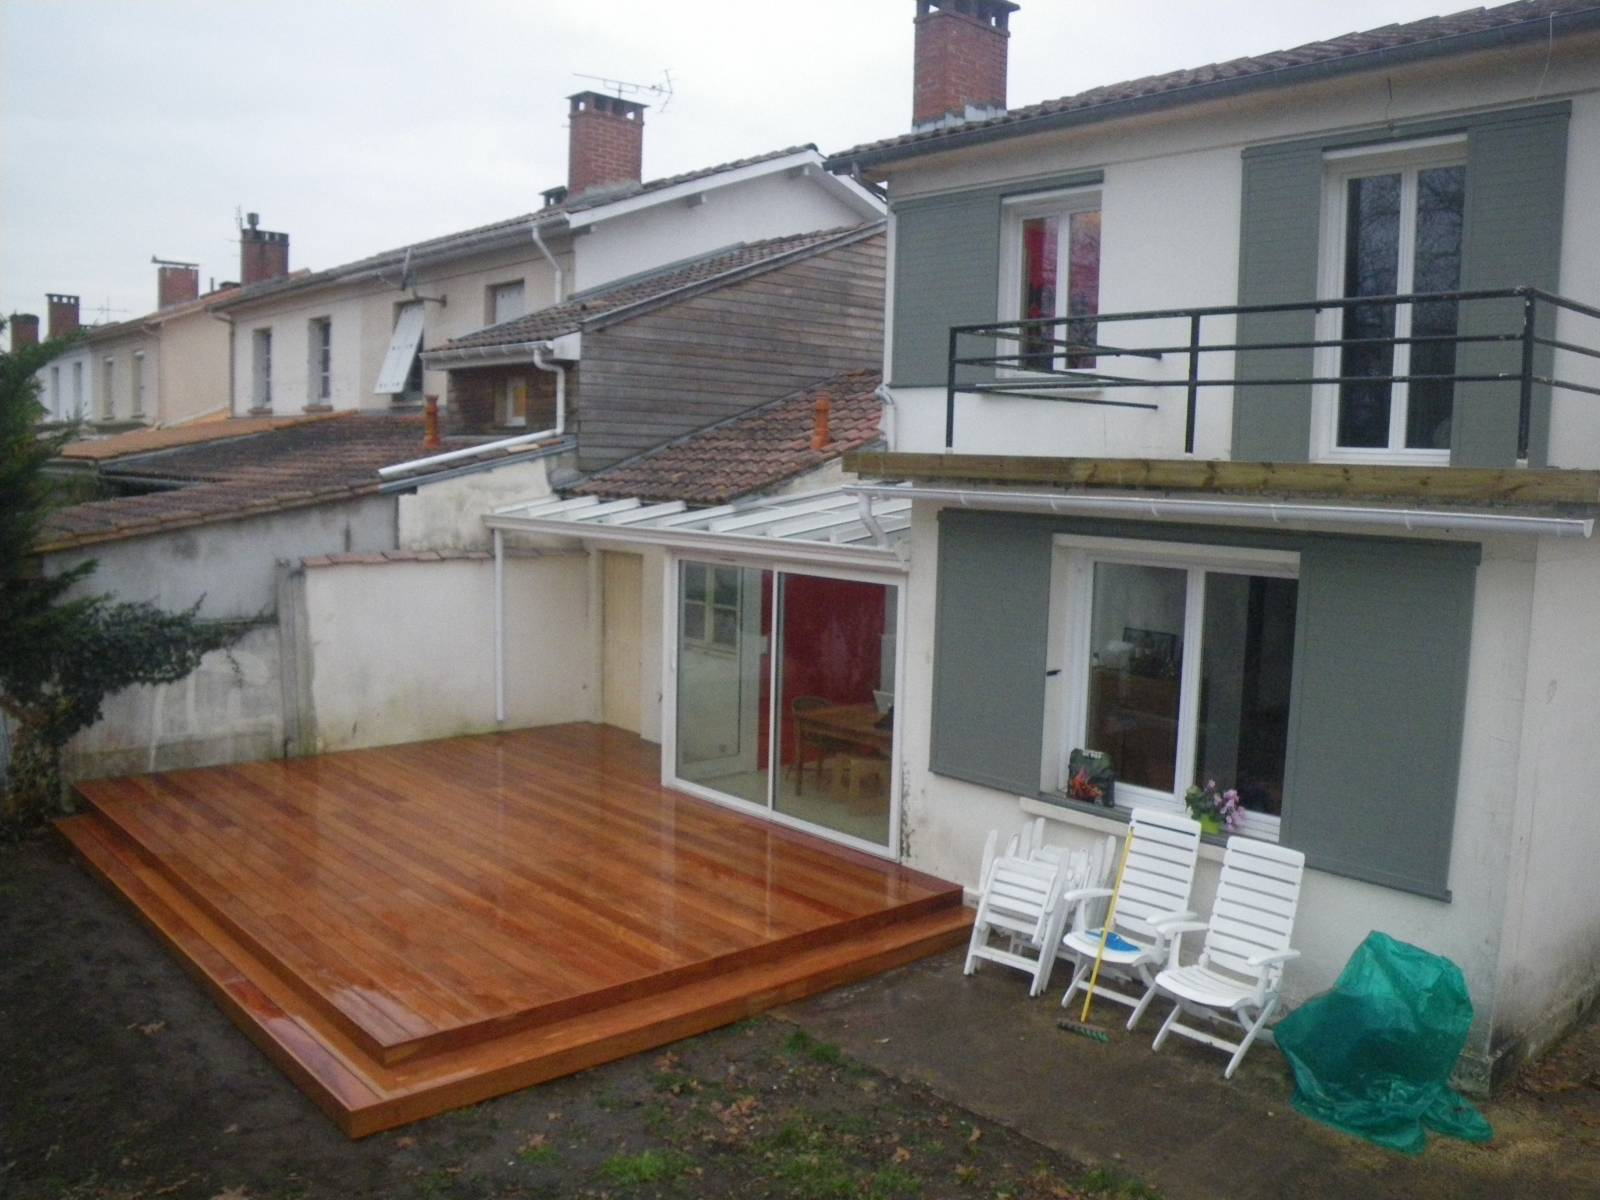 Terrasse En Bois Exotique pose terrasse en bois exotique cumaru en gironde sud - deck